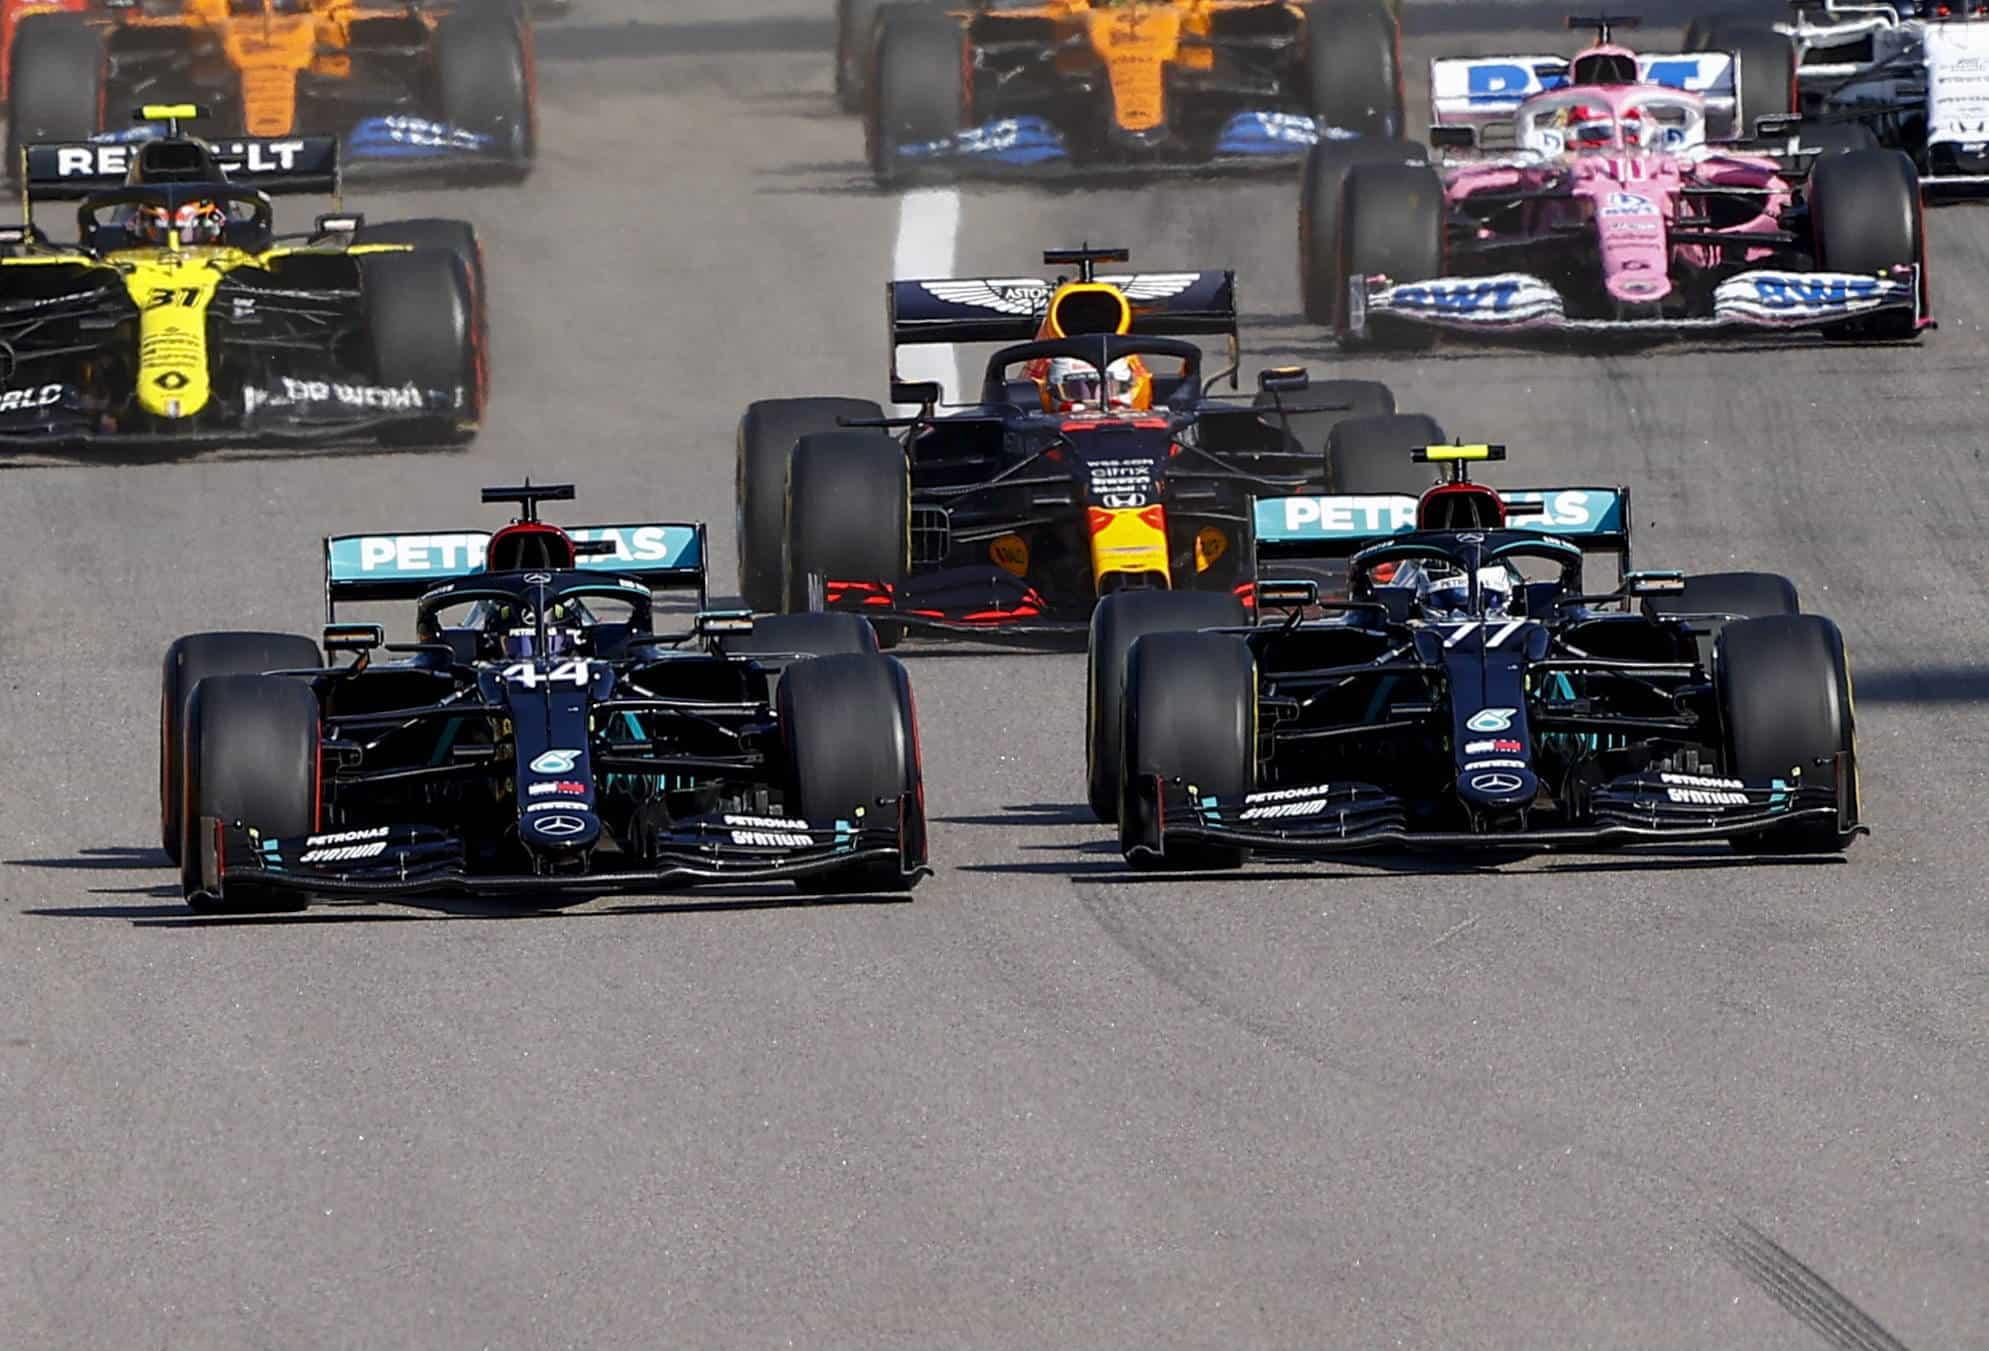 2020 Russian GP start zoom on Hamilton and Bottas Mercedes F1 W11 Photo Daimler